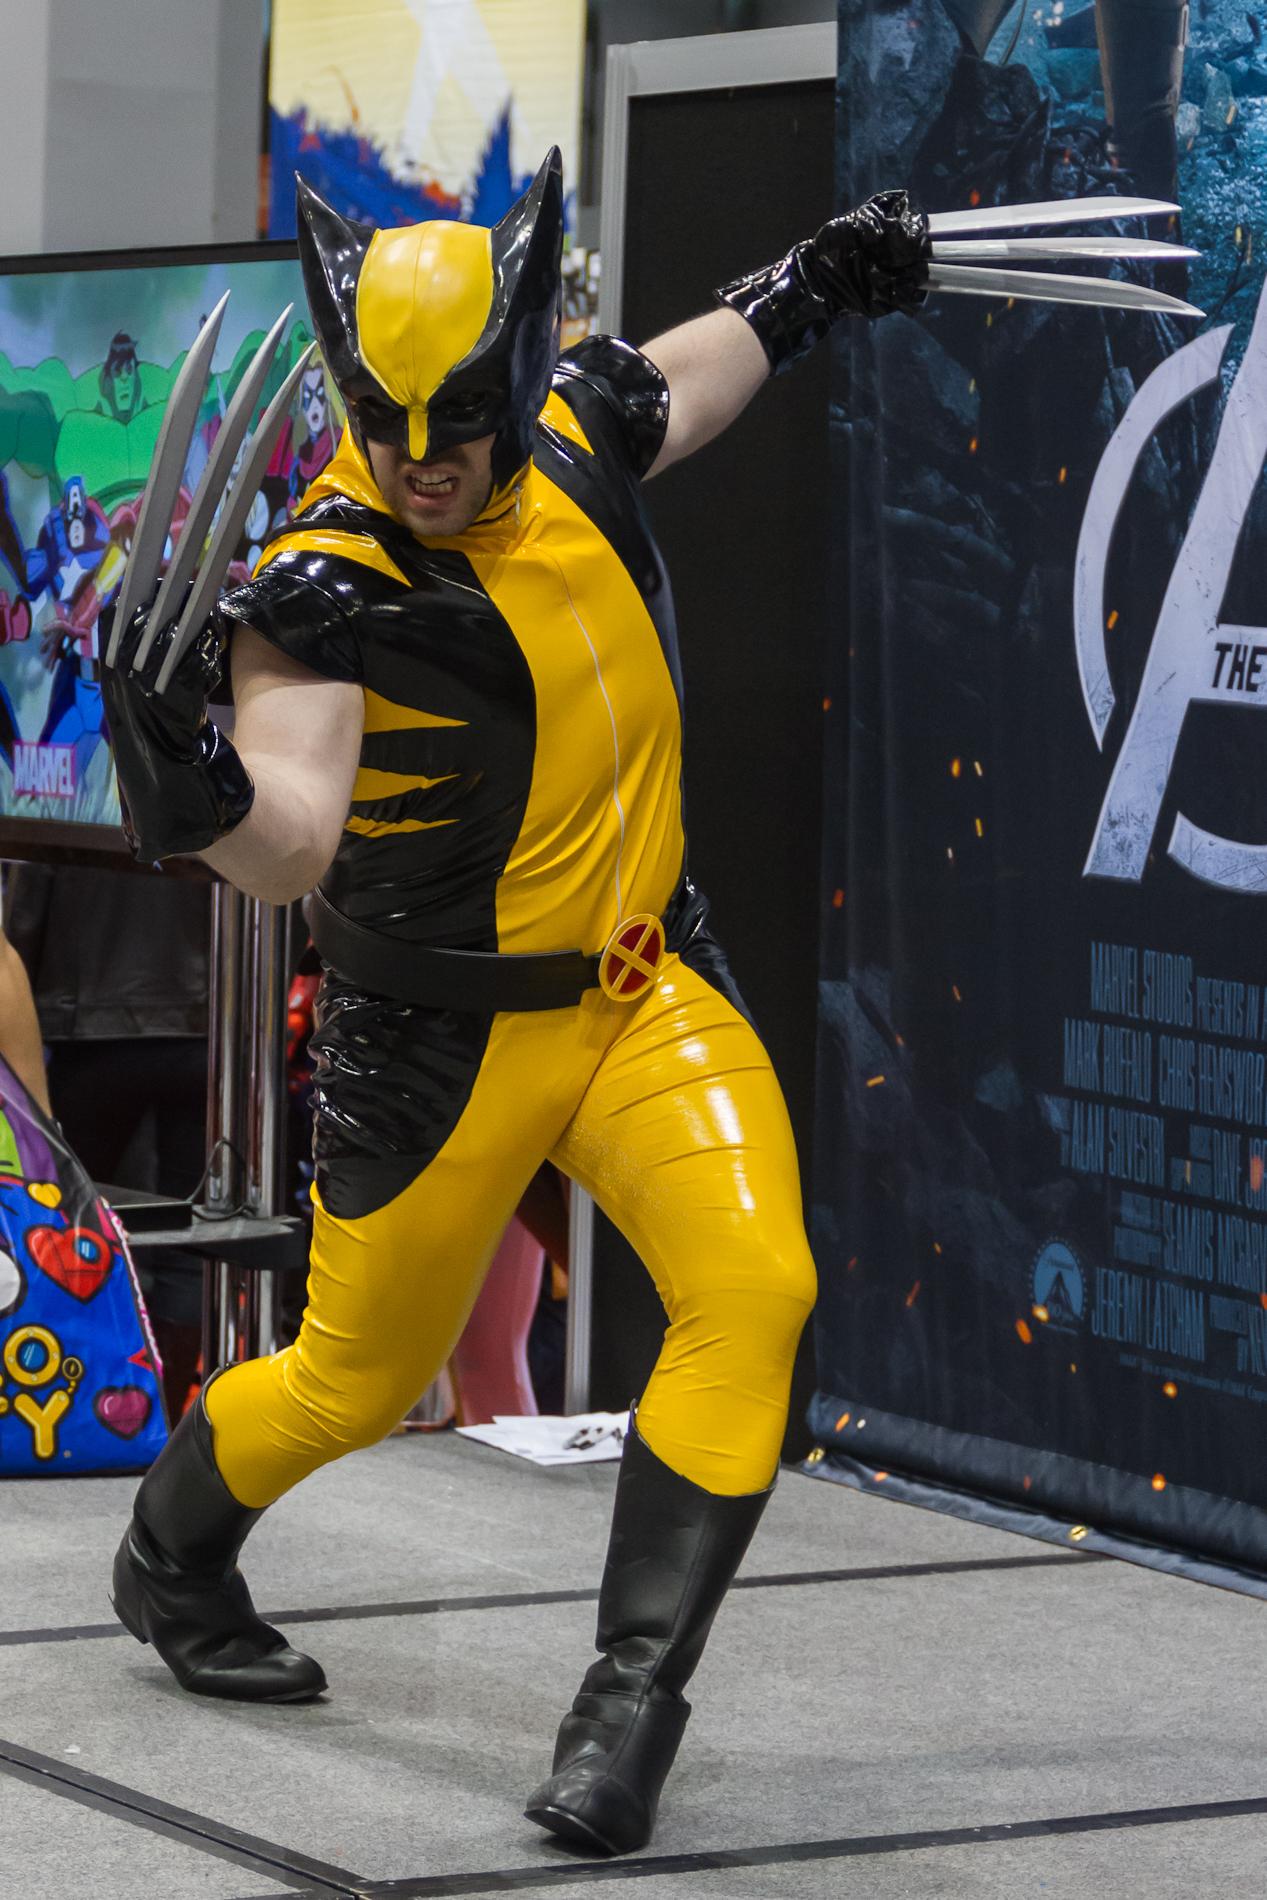 http://upload.wikimedia.org/wikipedia/commons/6/69/Wolverine_Cosplay_2.jpg